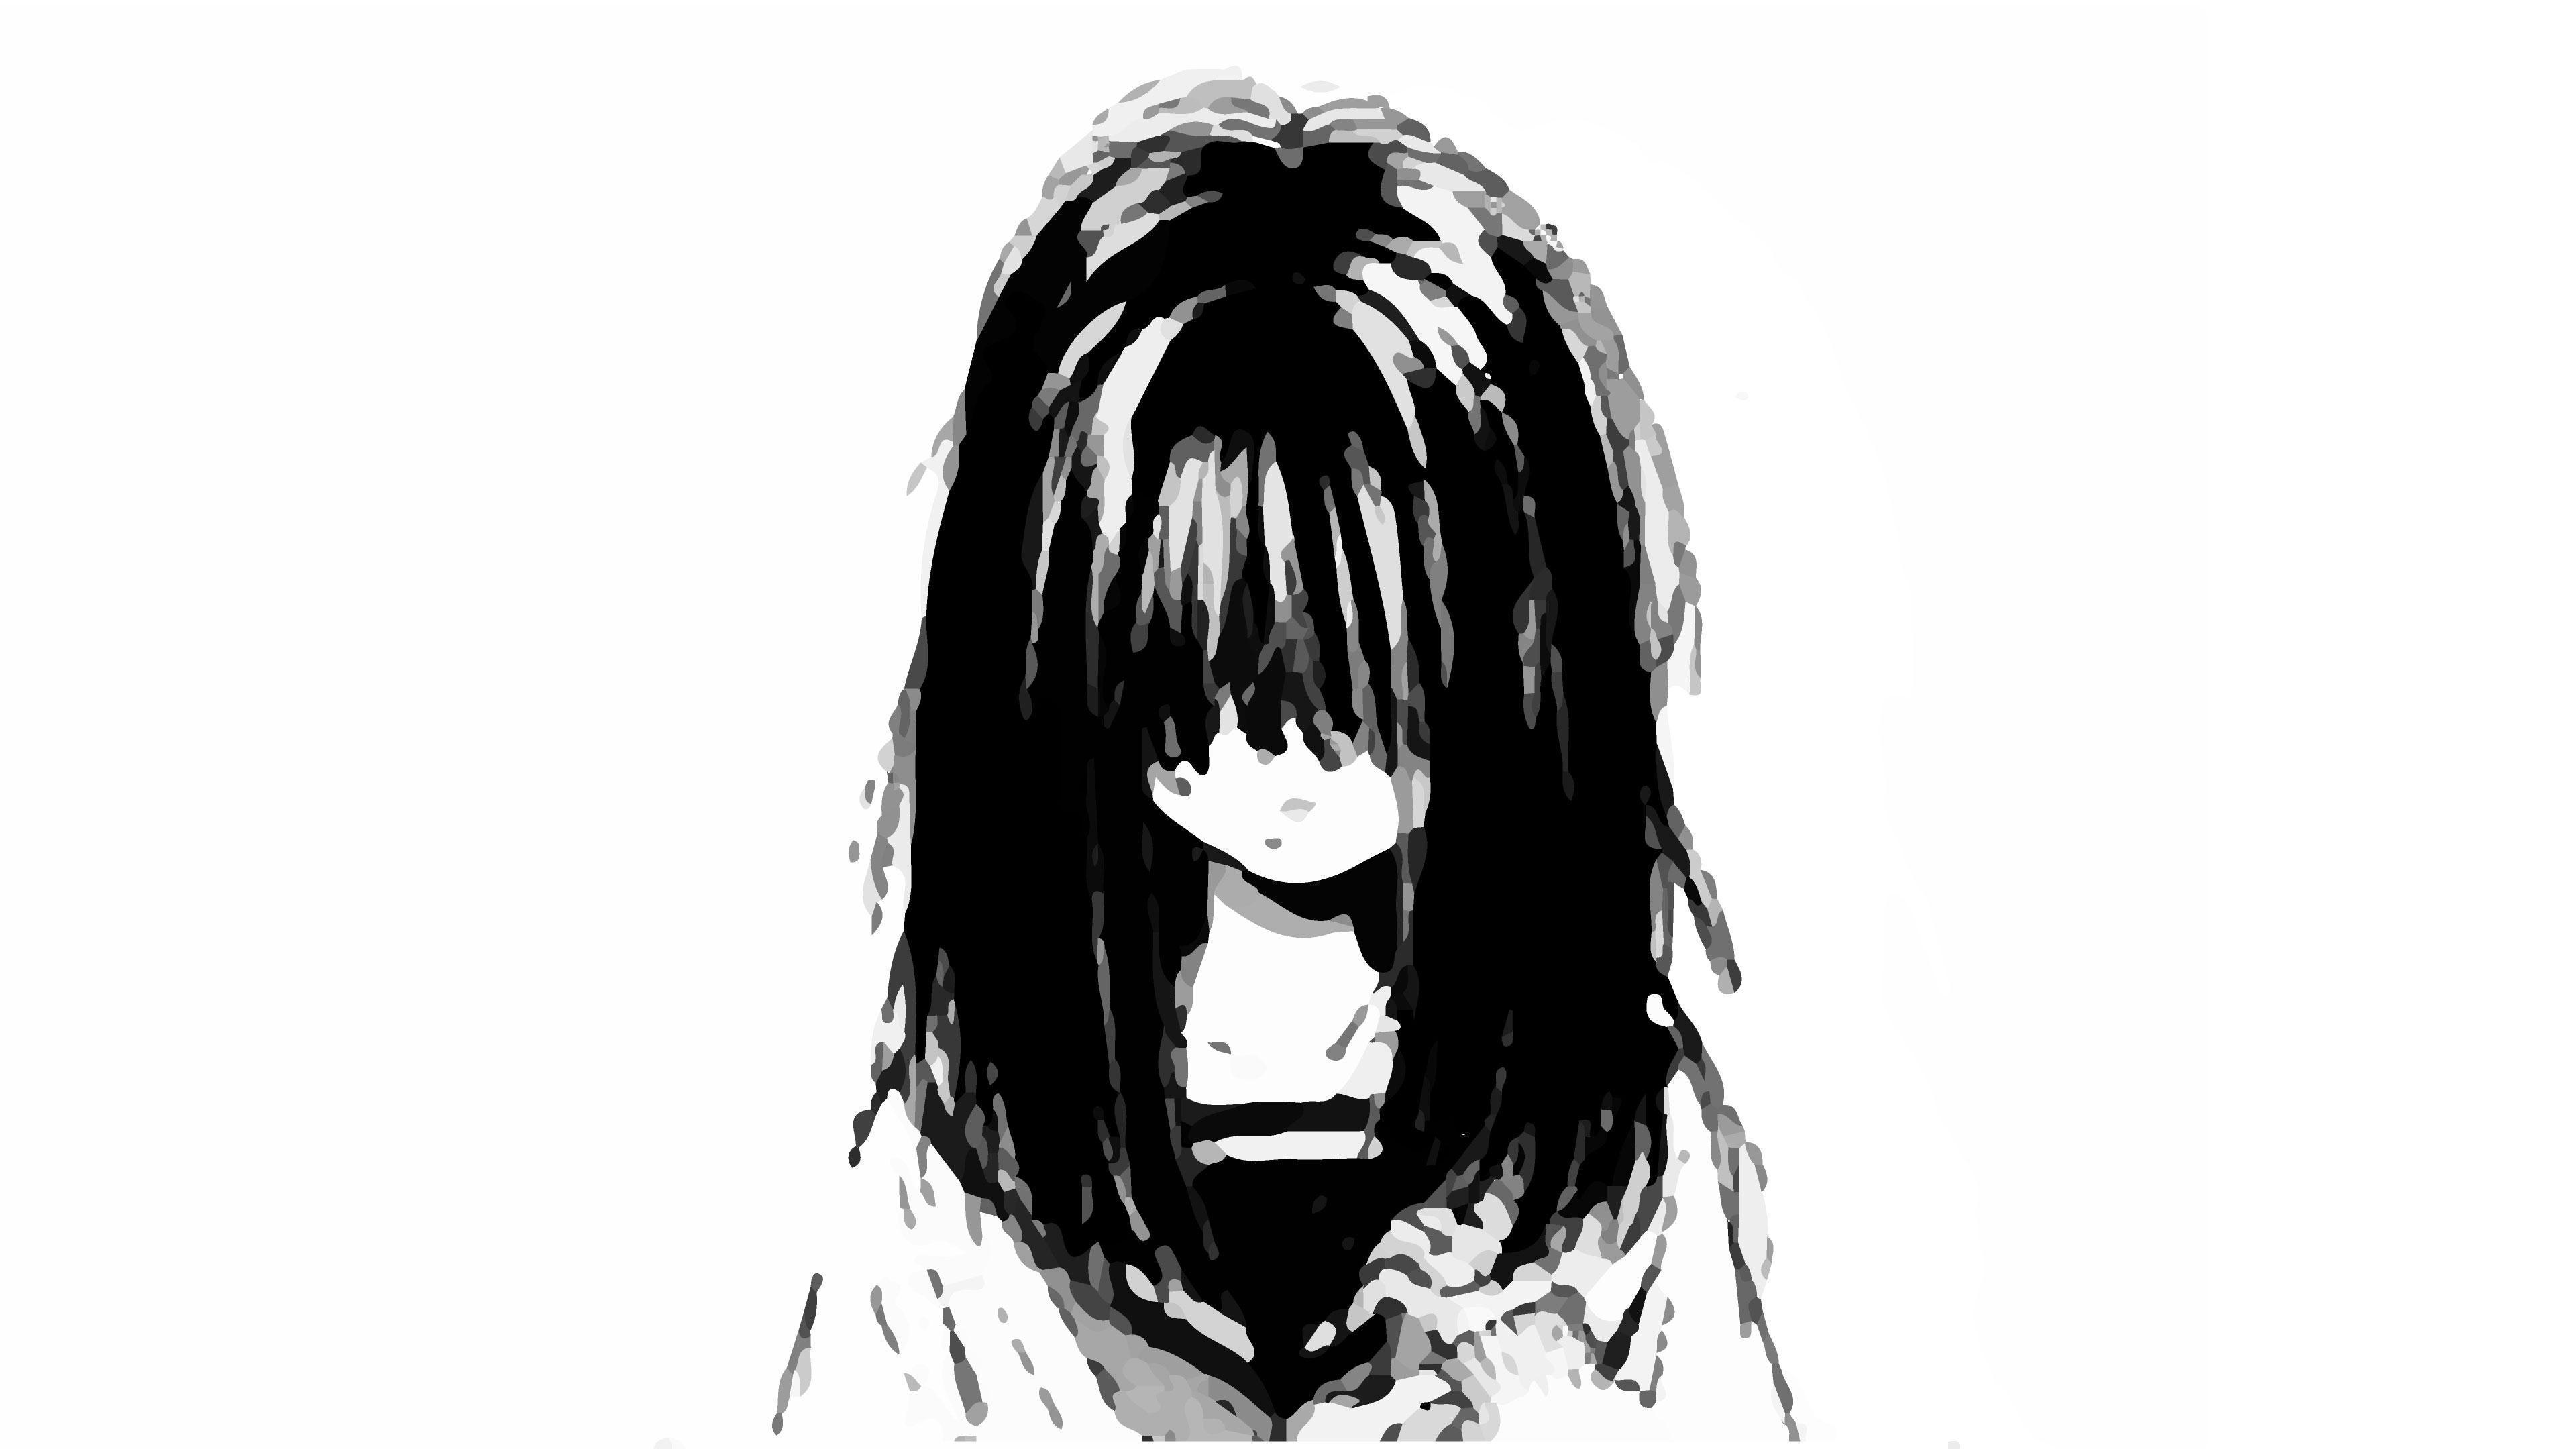 Sad aesthetic wallpaper anime free download wallpaper. Aesthetic Sad Anime Girl Wallpapers - Top Free Aesthetic ...